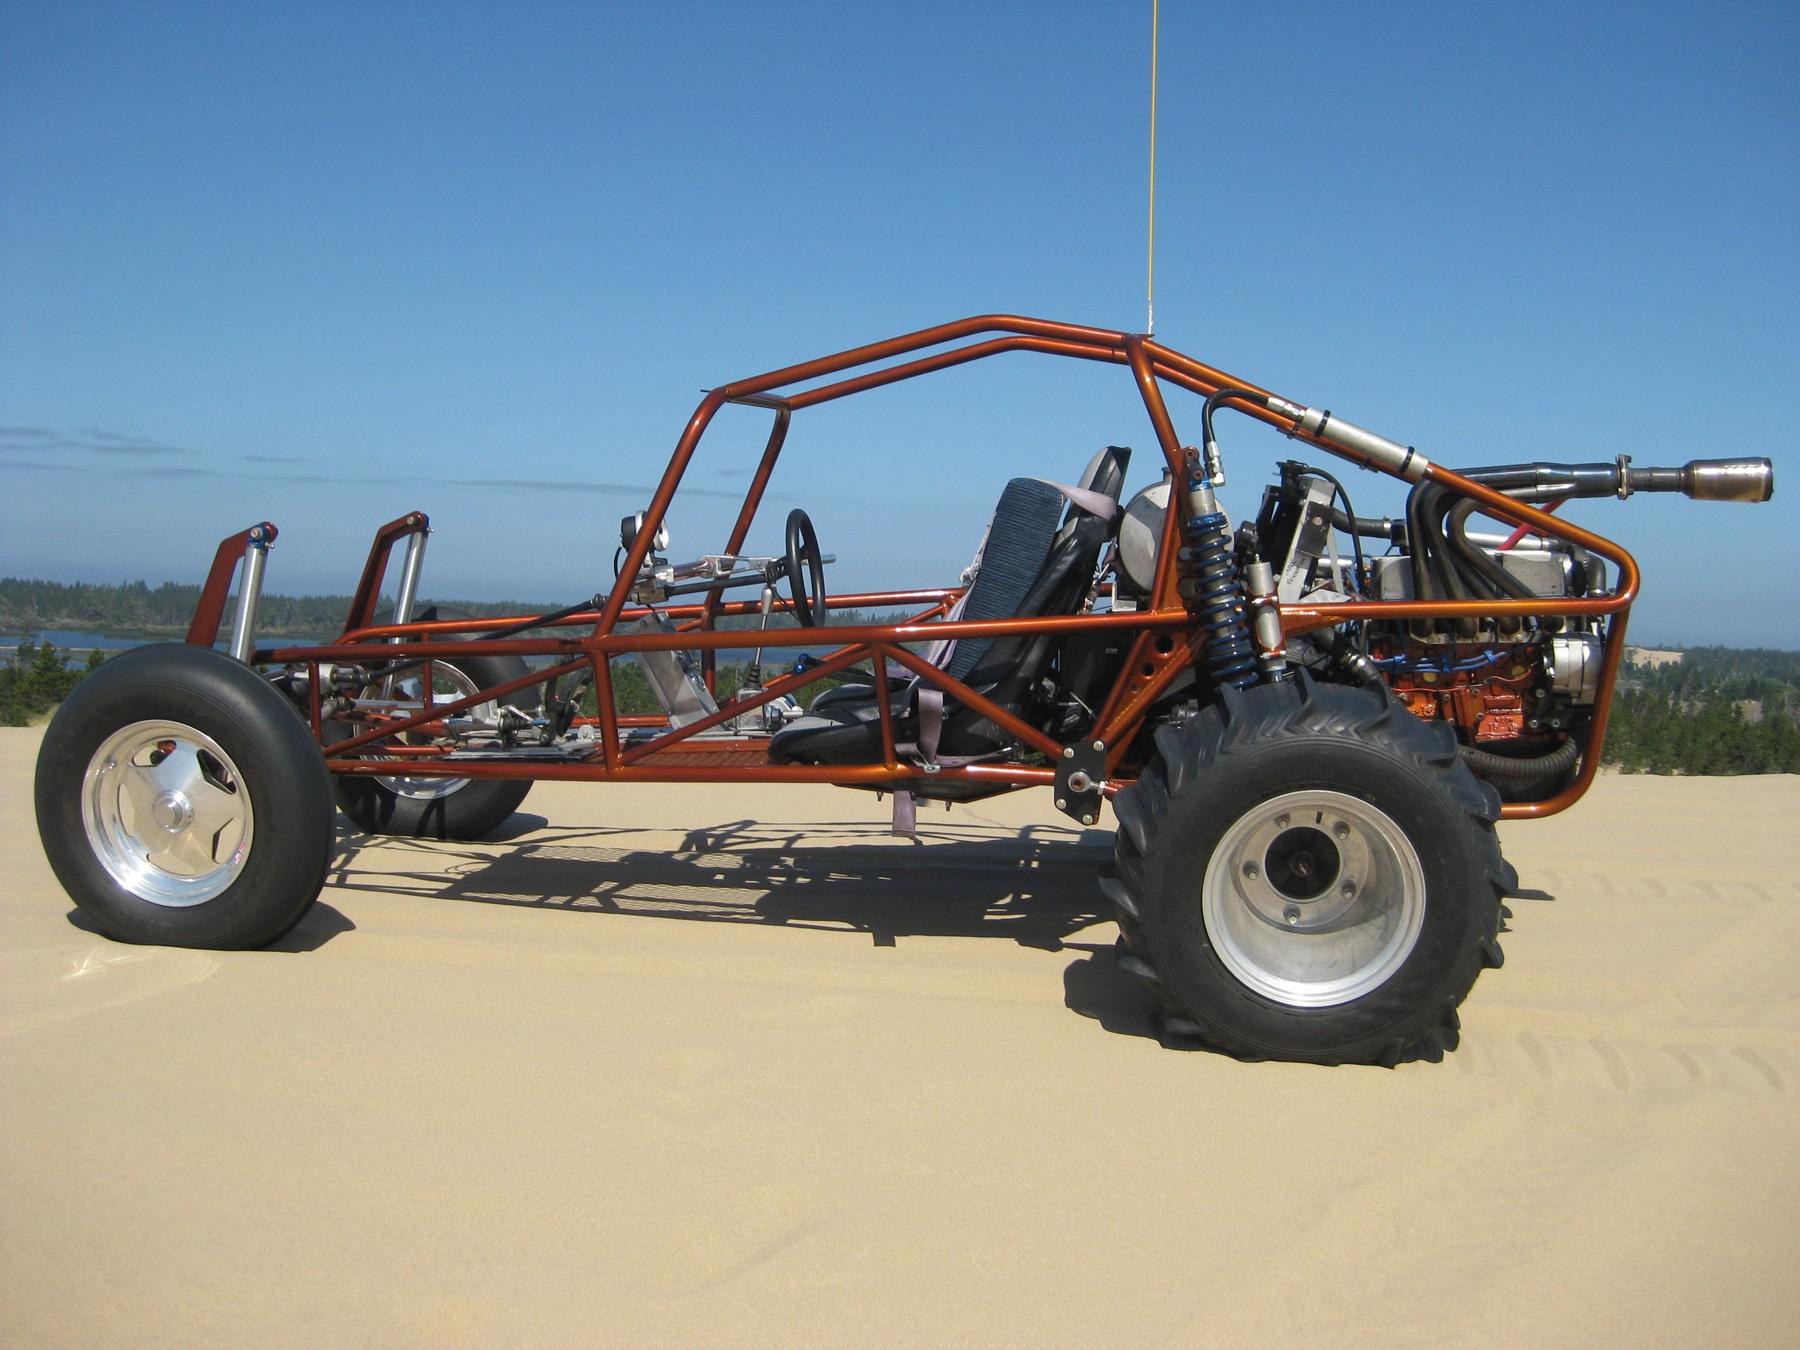 Rail Buggy Motor.Rovan Blue Steel Metal Buggy Sand Rail Roll Cage ...